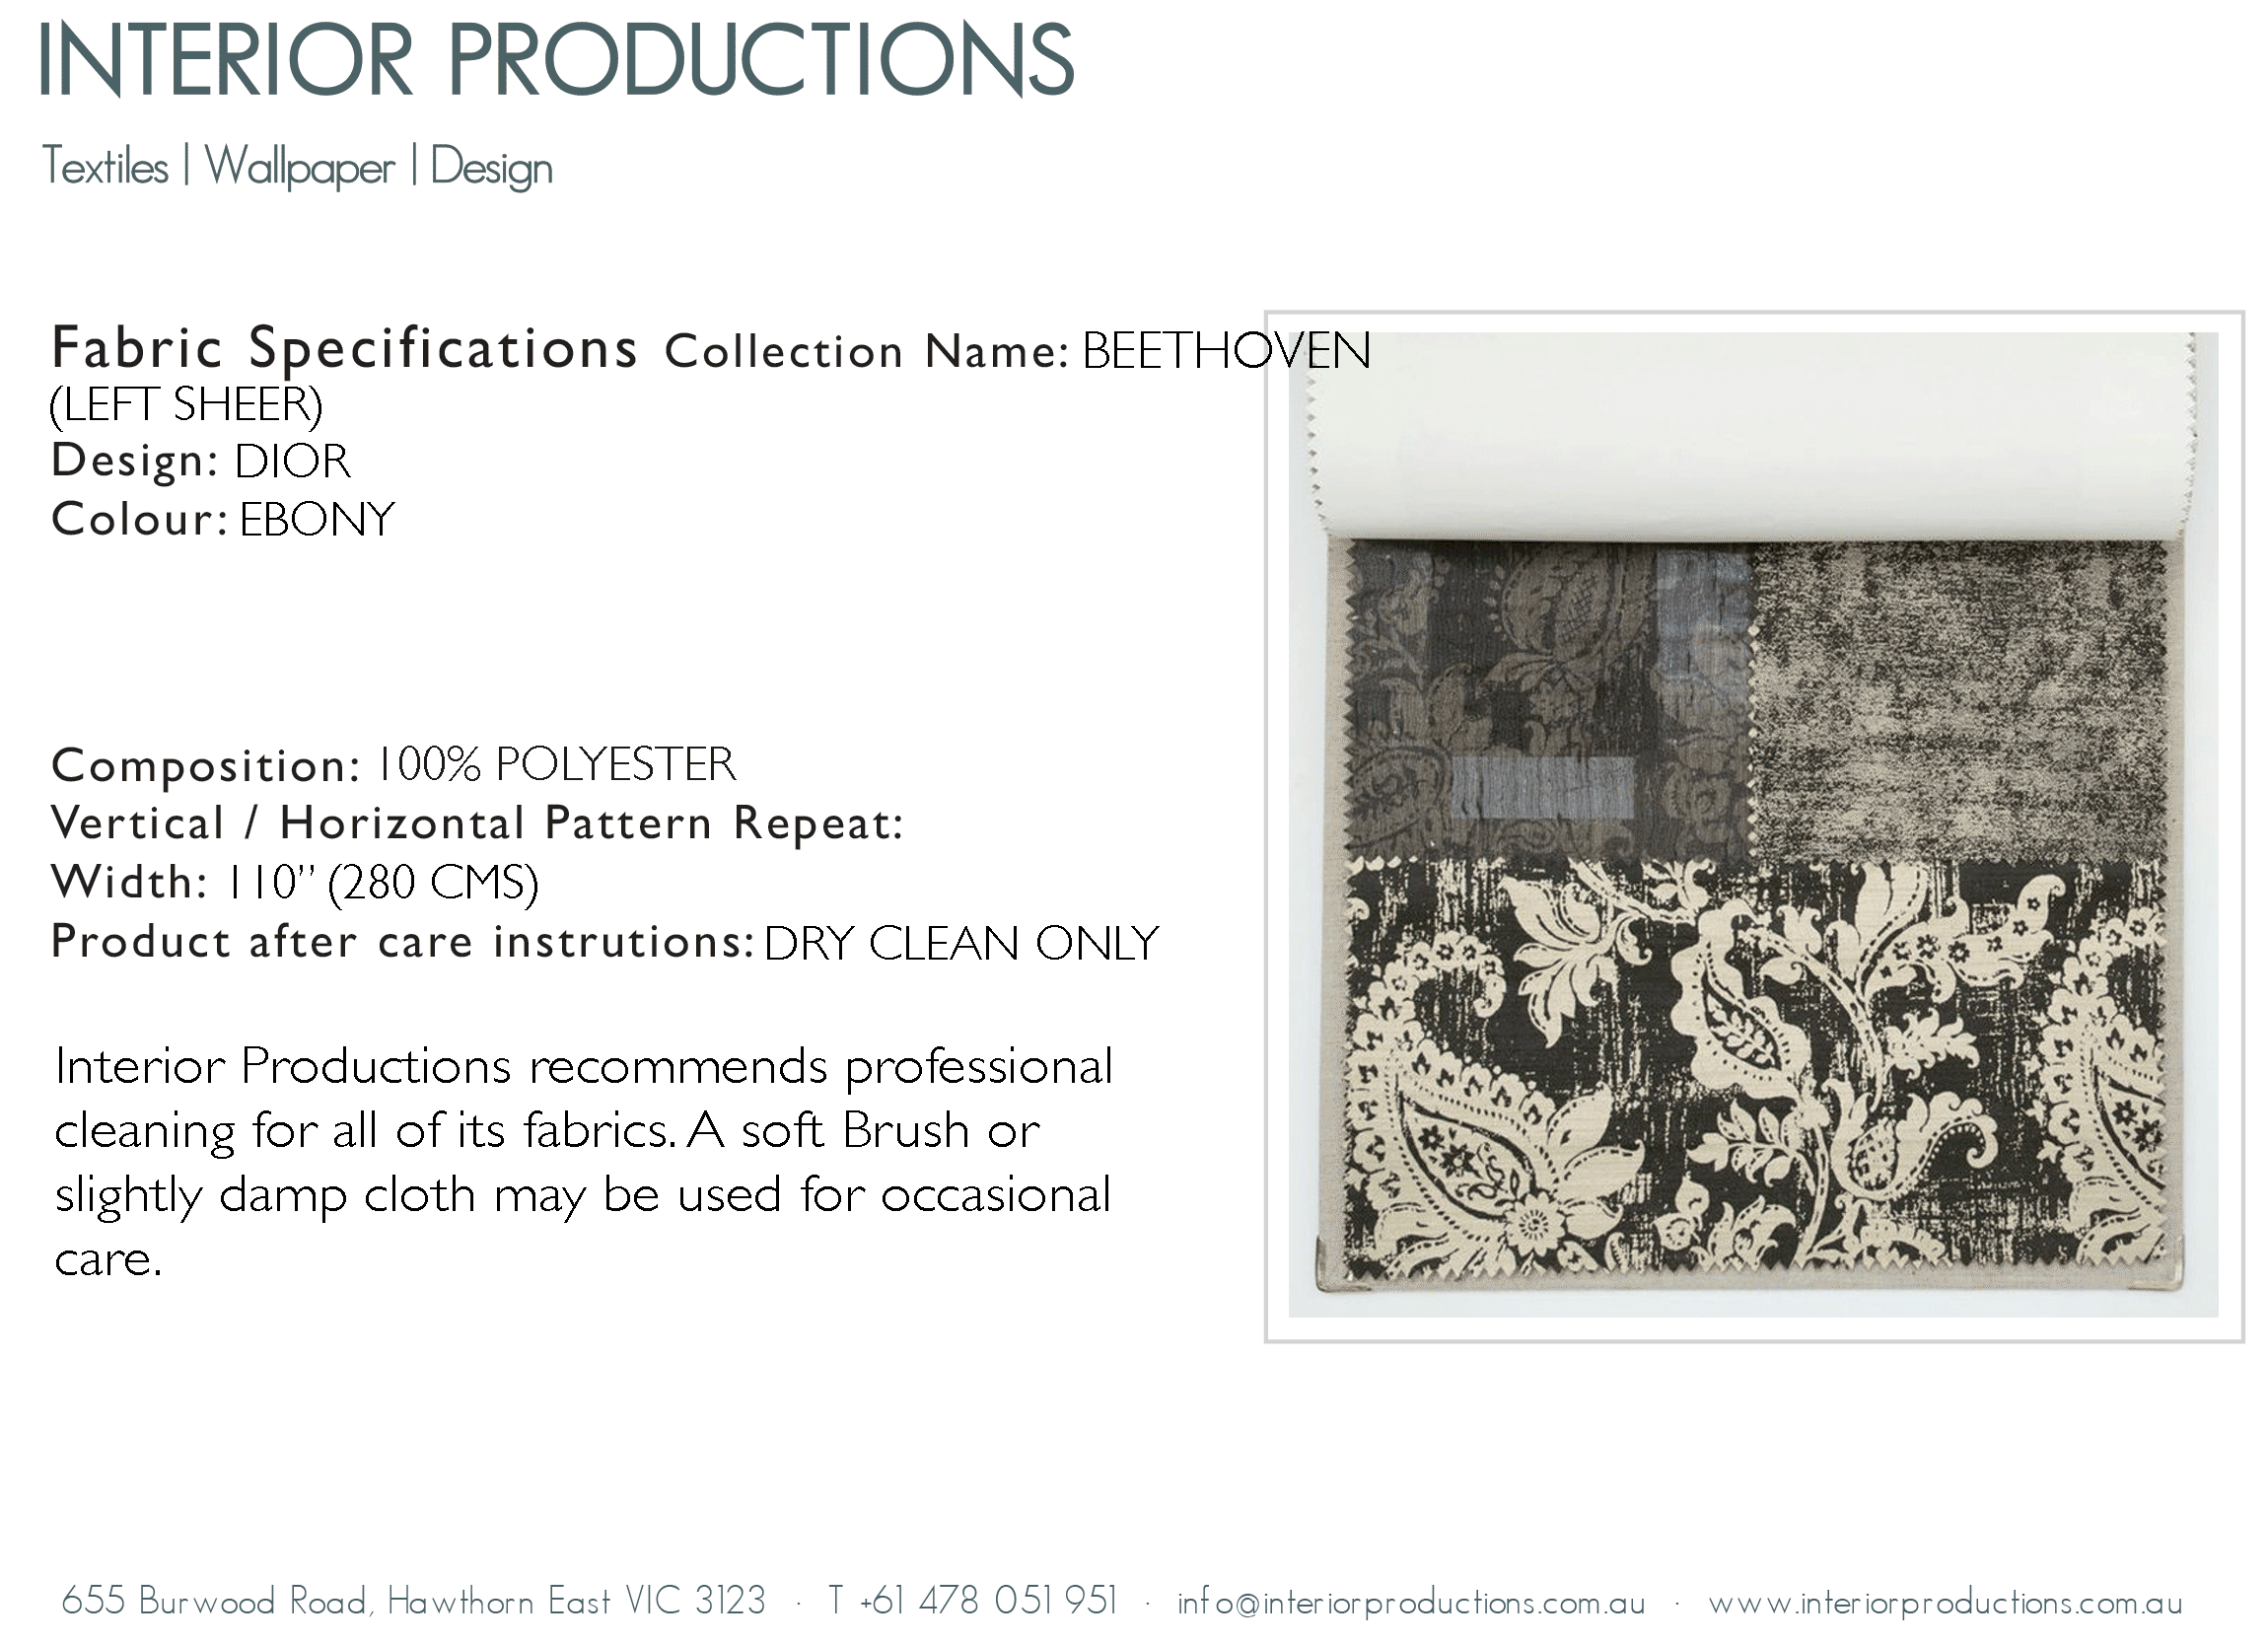 interior_productions_DIOR---EBONY